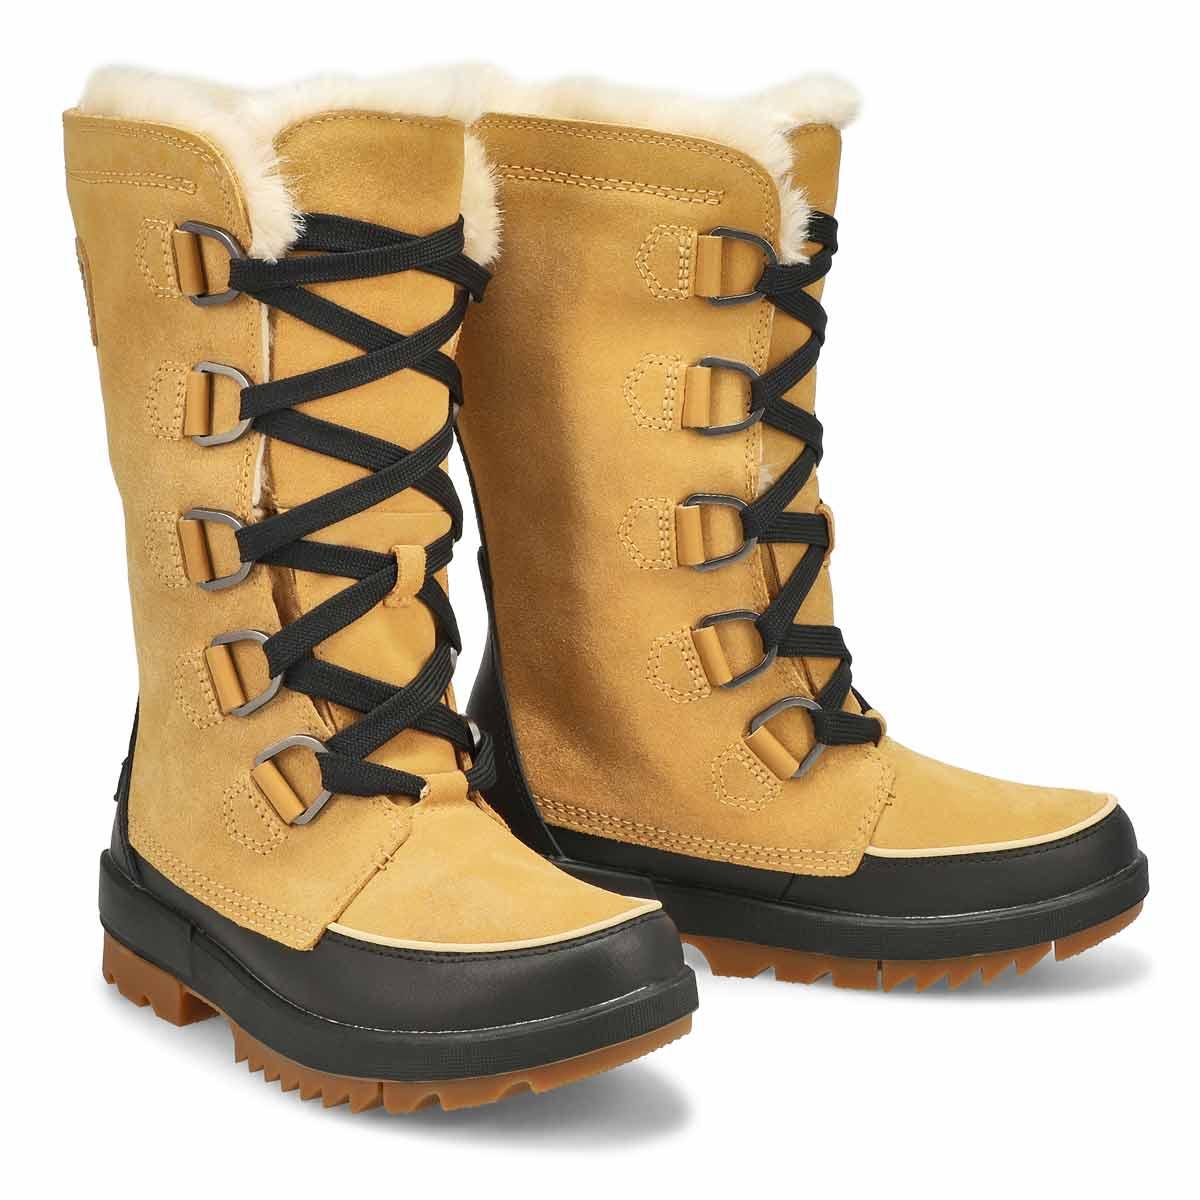 Women's Tivoli IV Tall Waterproof Boot - Curry/Blk